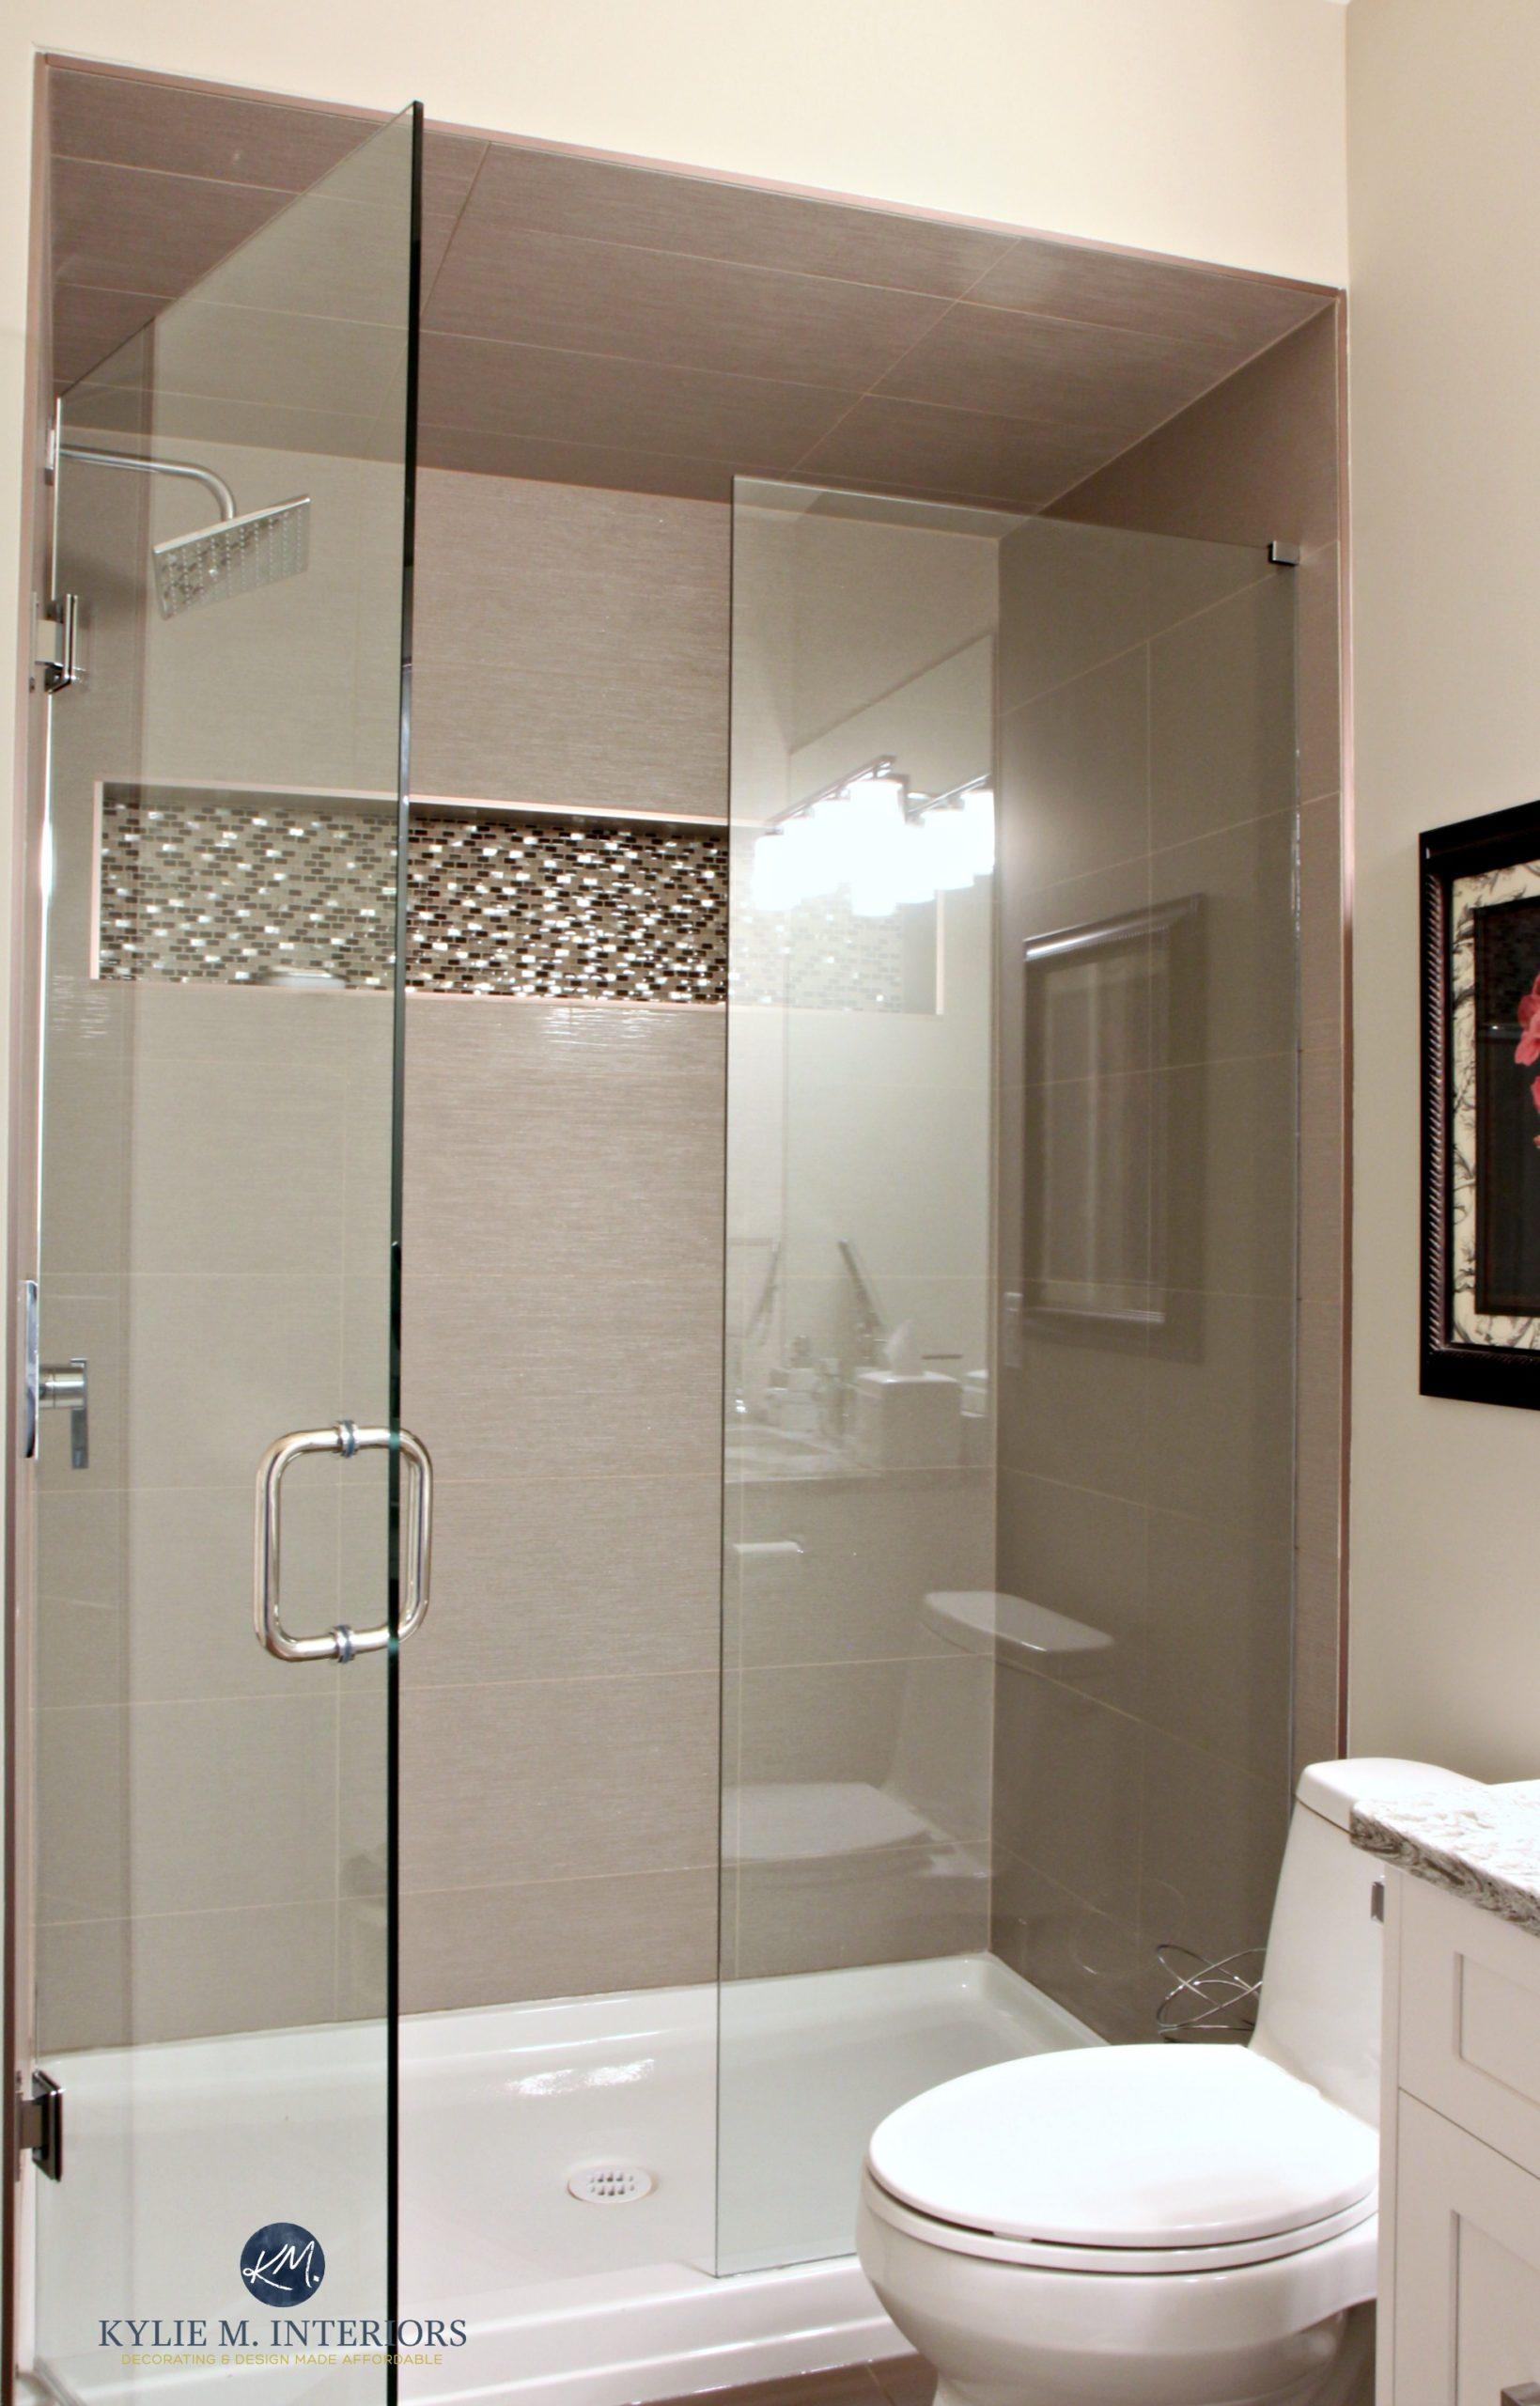 Quirky Bathroom Decor